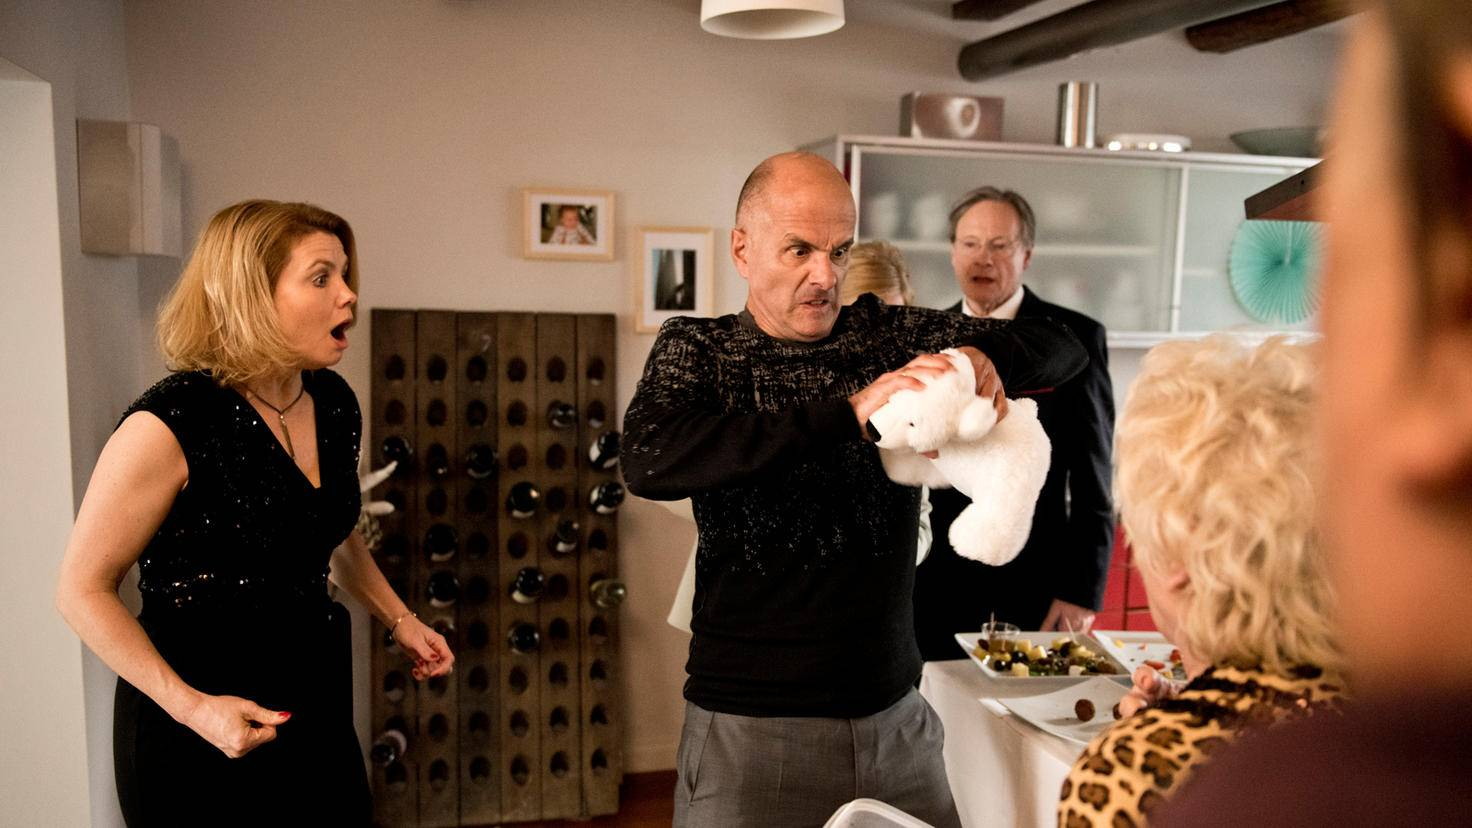 Feiern der Familie Merz/Reichert enden nicht selten im absoluten Chaos.